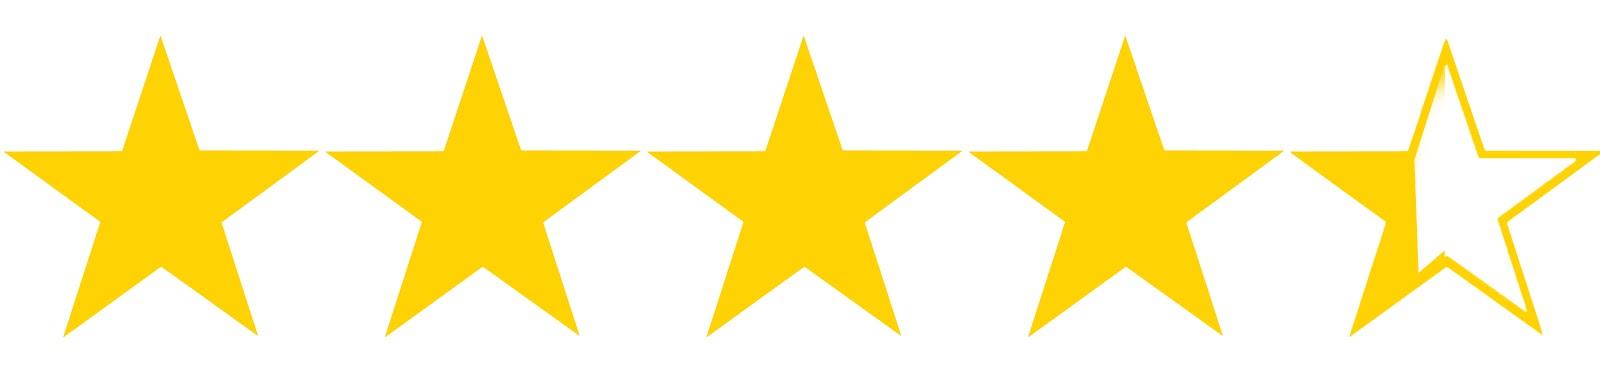 Image result for star 4.25 stars